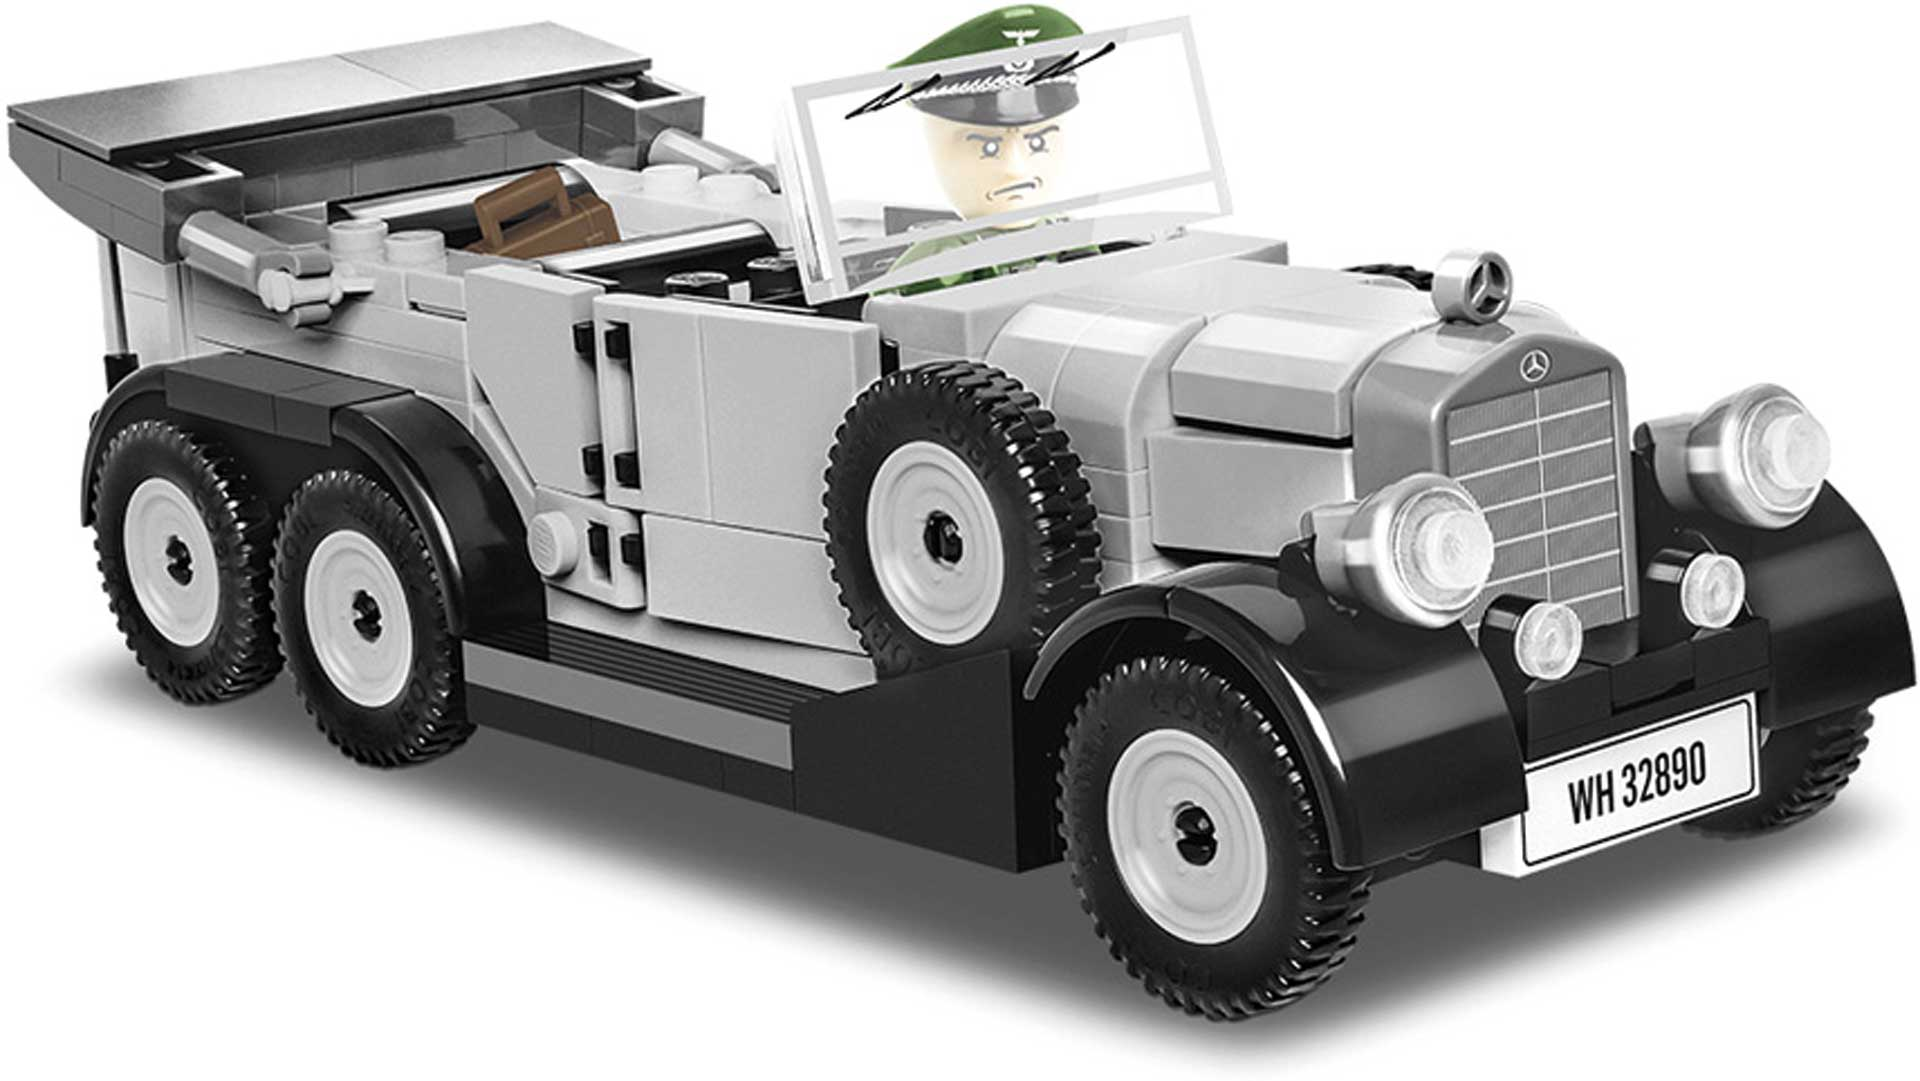 COBI 1939 Mercedes G4 (272 Teile) Klemmbausteine